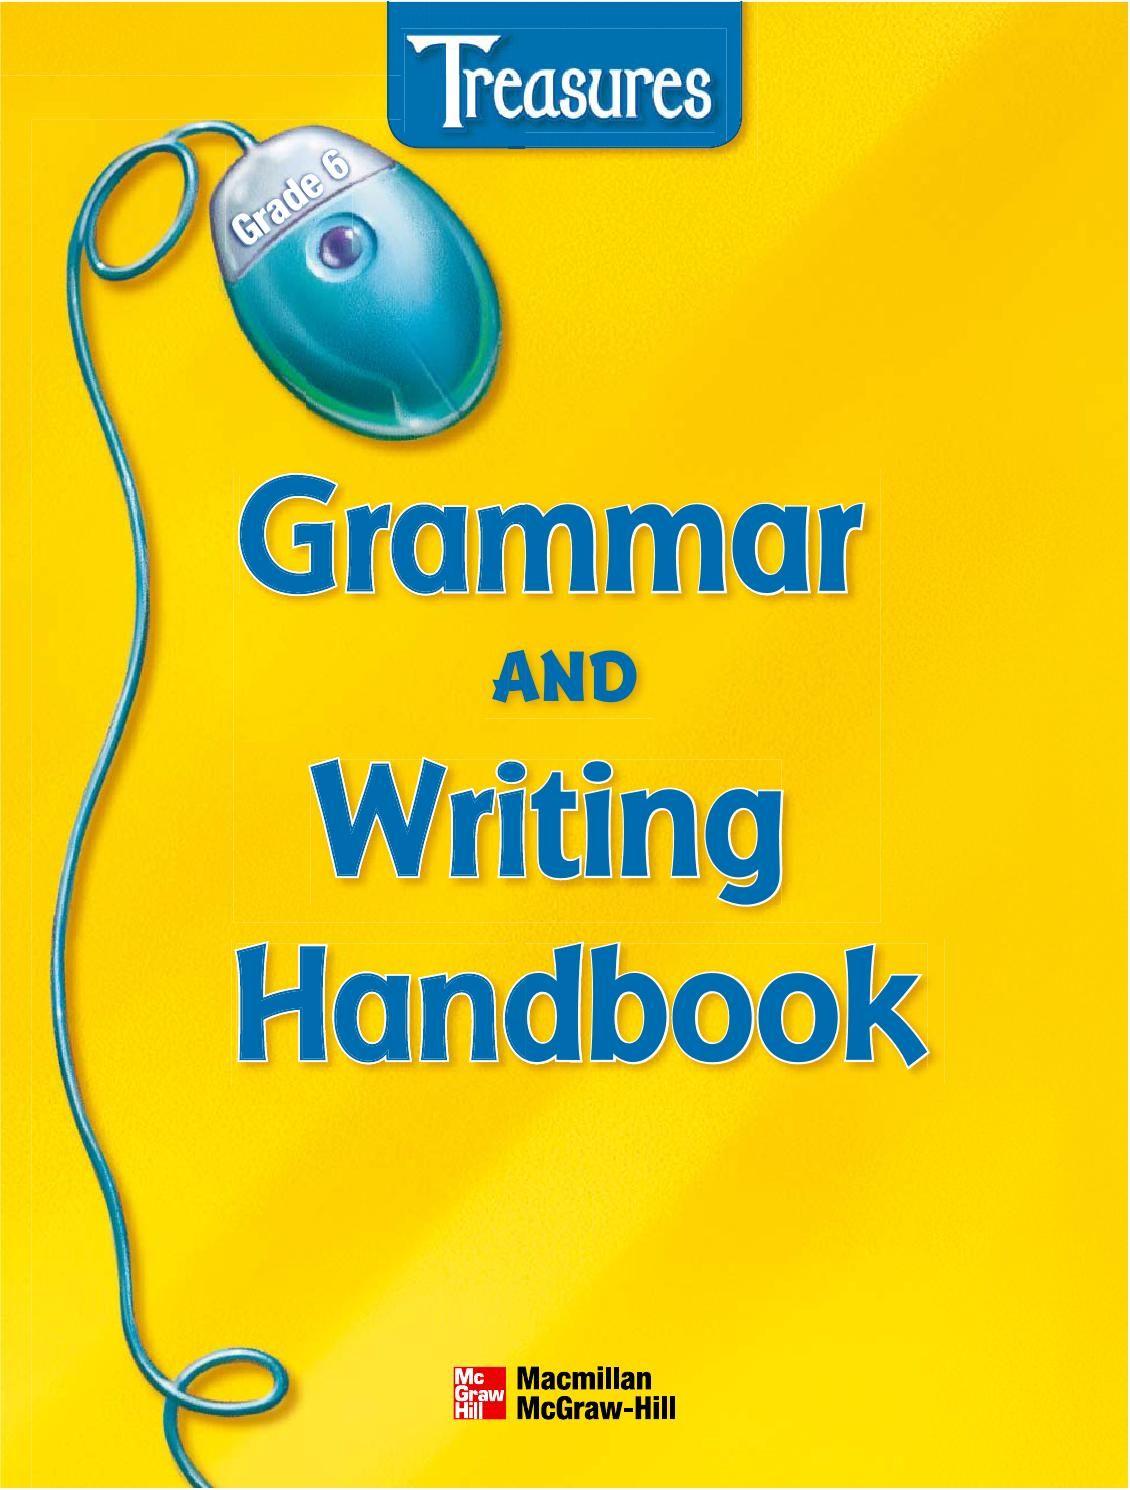 Issuu Is A Digital Publishing Platform That Makes It Simple To Publish Magazines Catalogs Newspapers Book English Grammar Book Grammar Workbook Grammar Book [ 1490 x 1130 Pixel ]